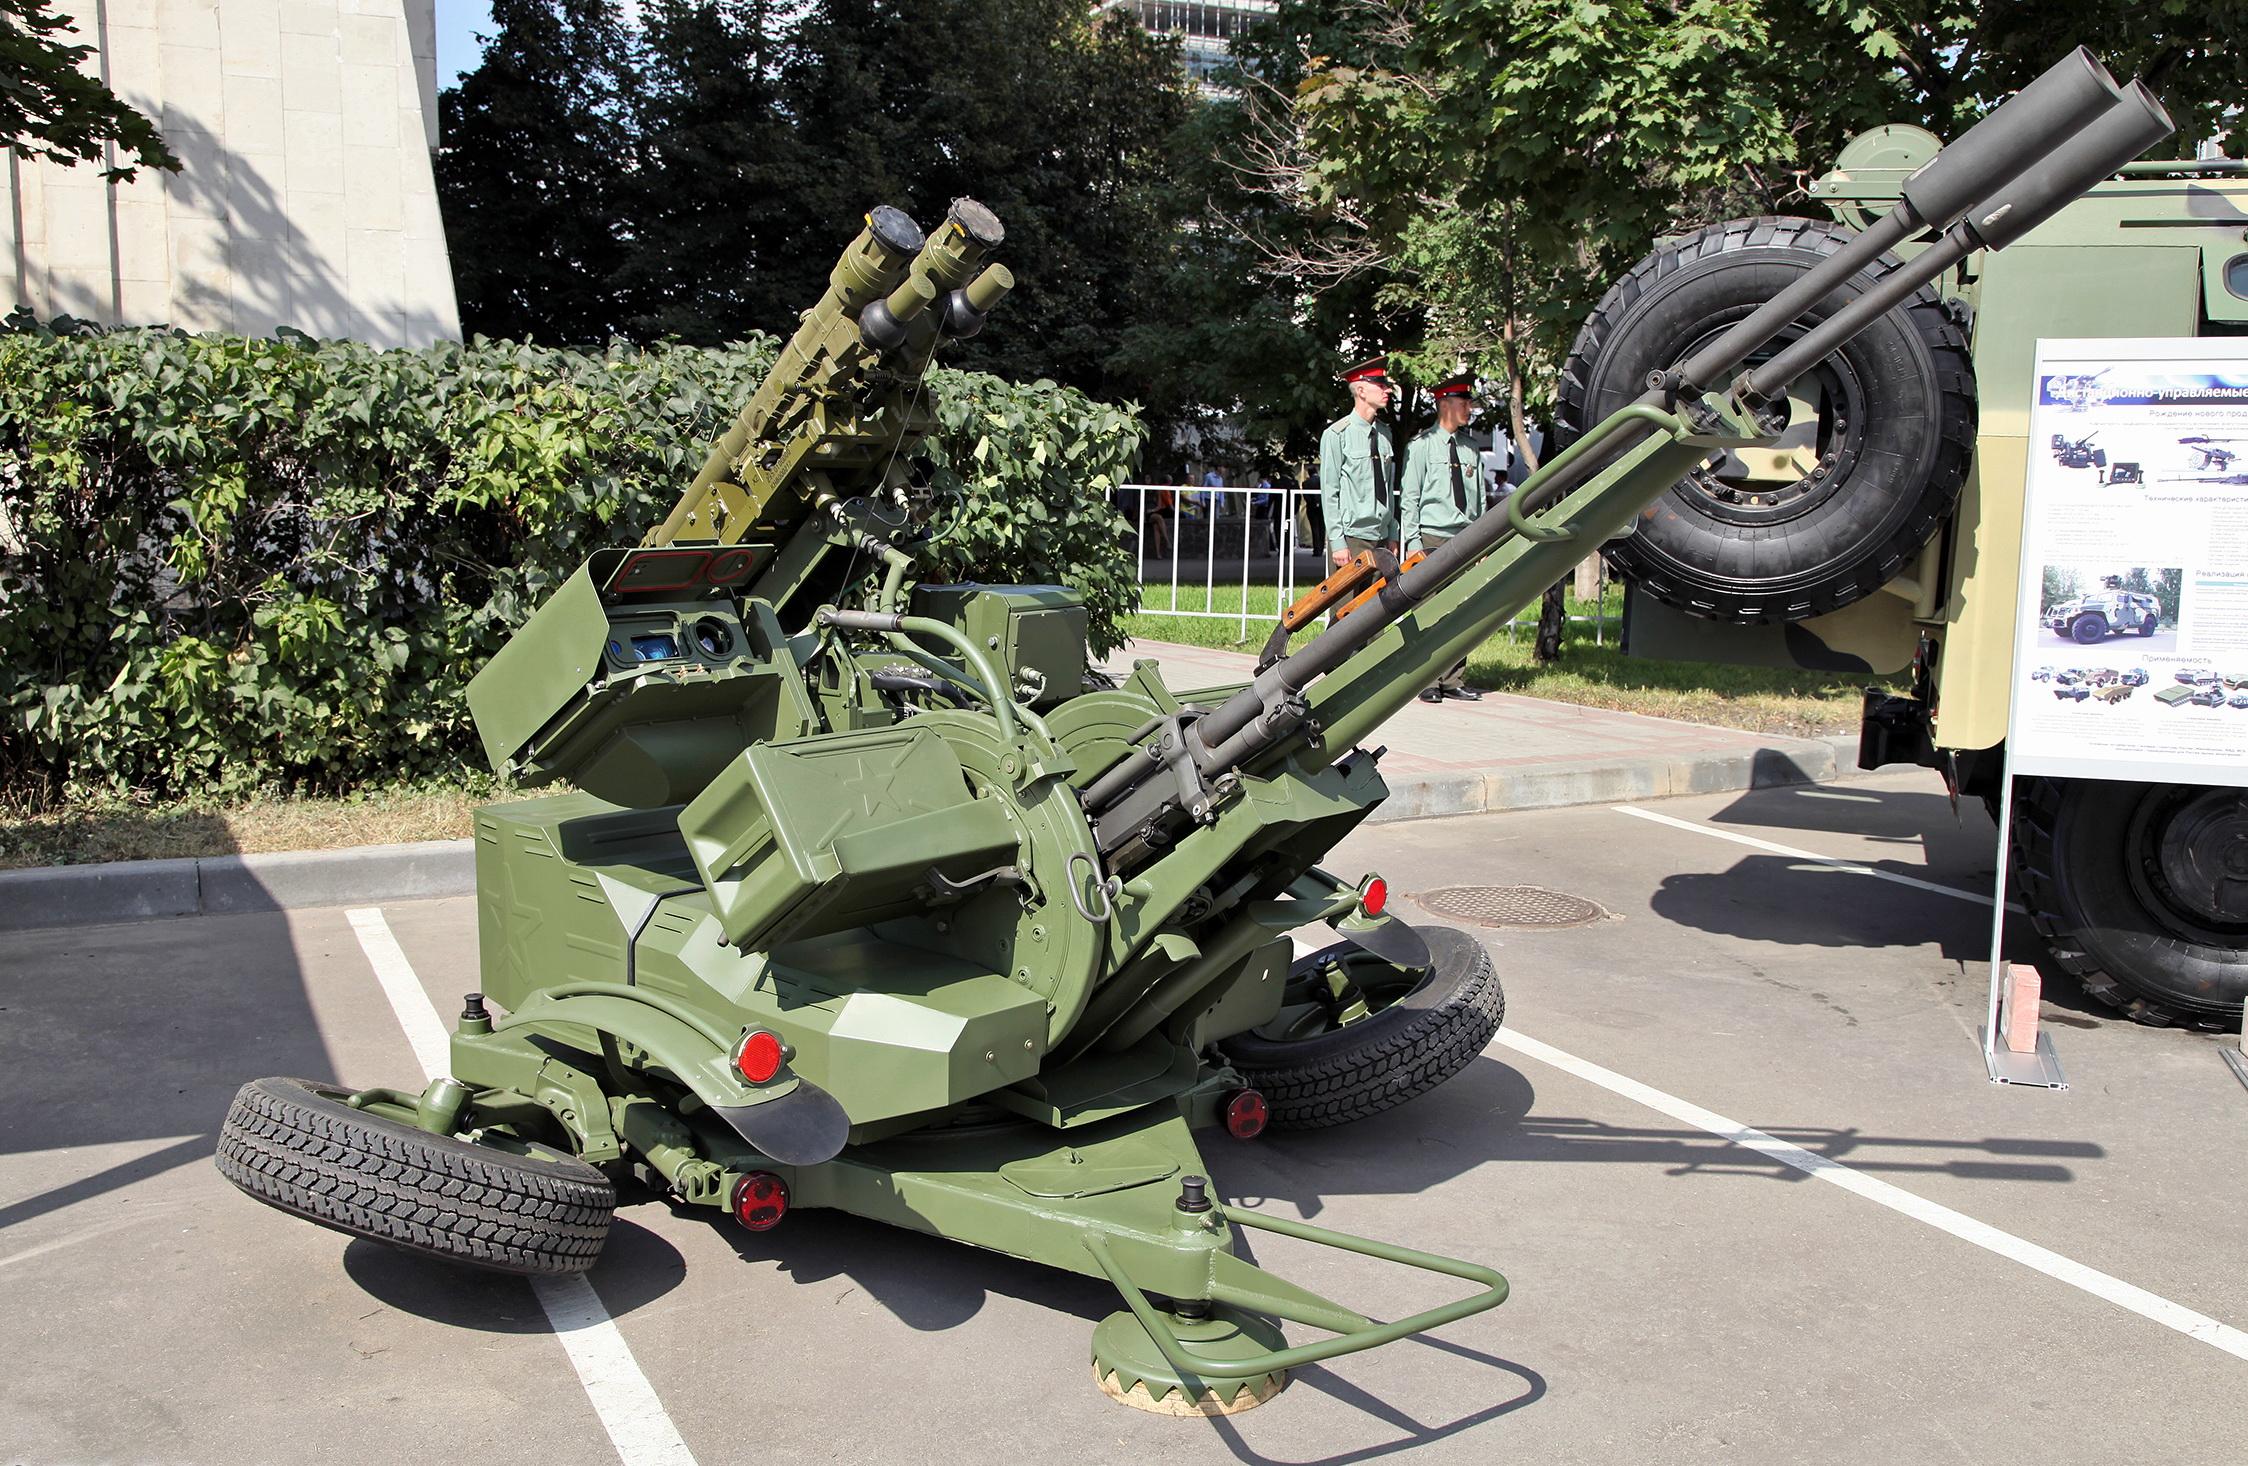 Piezas ZU-23-2/2A13 (ZU-23/ZOM-1-4) de 23mm Zu-23_30_M1-3_-_InnovationDay2013part1-40